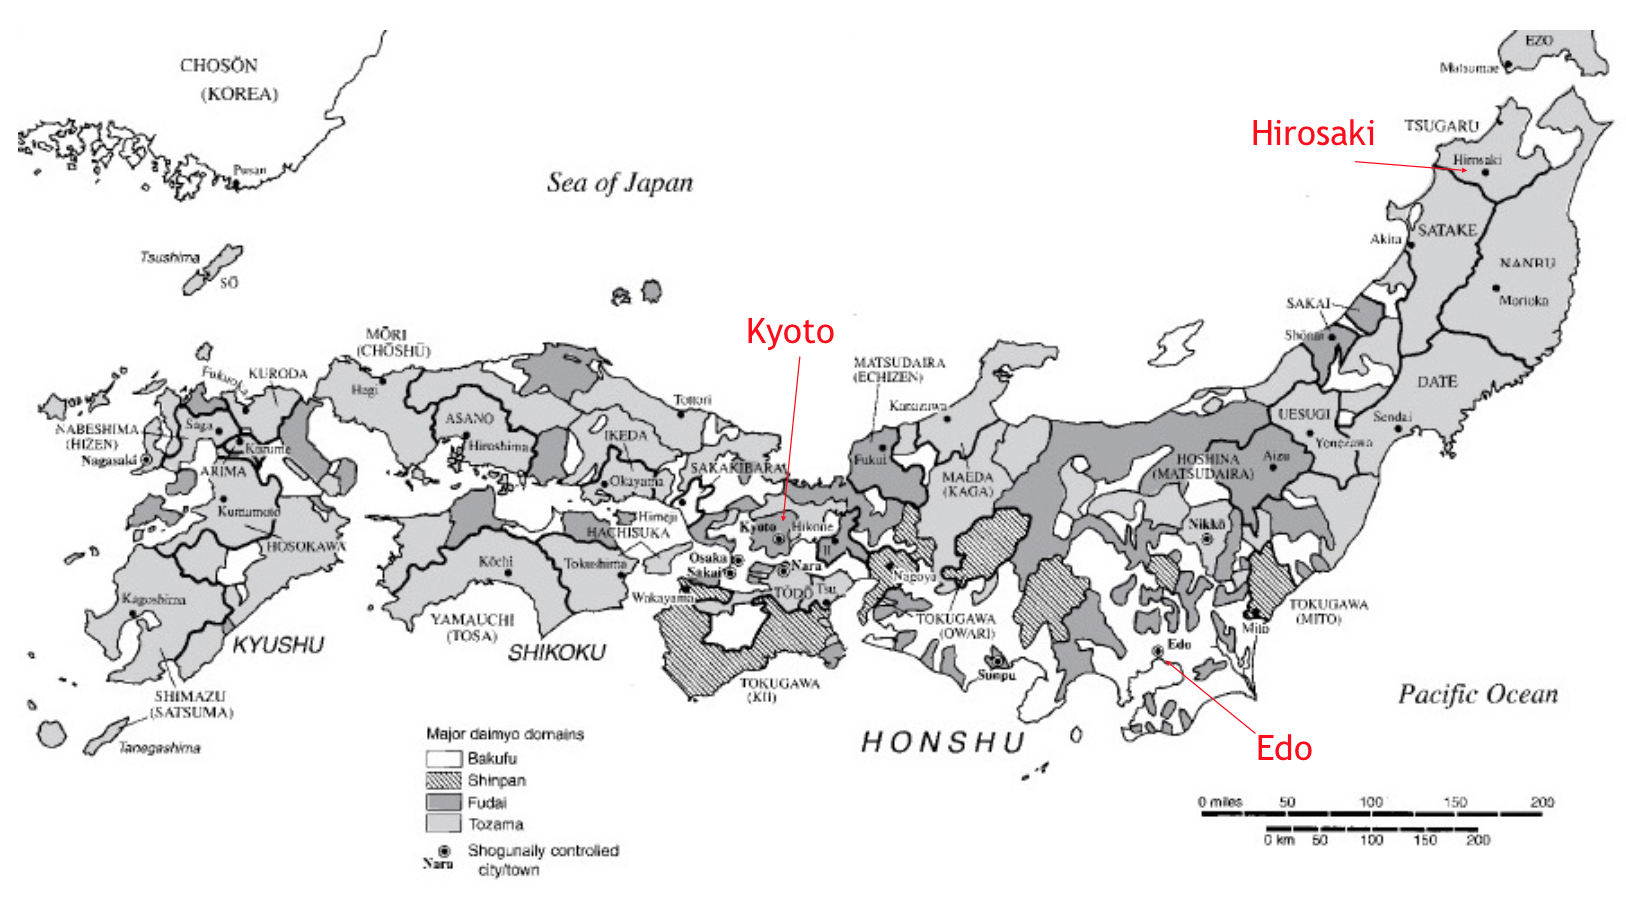 Map of Japan highlighting Daimyo domains in 1664.